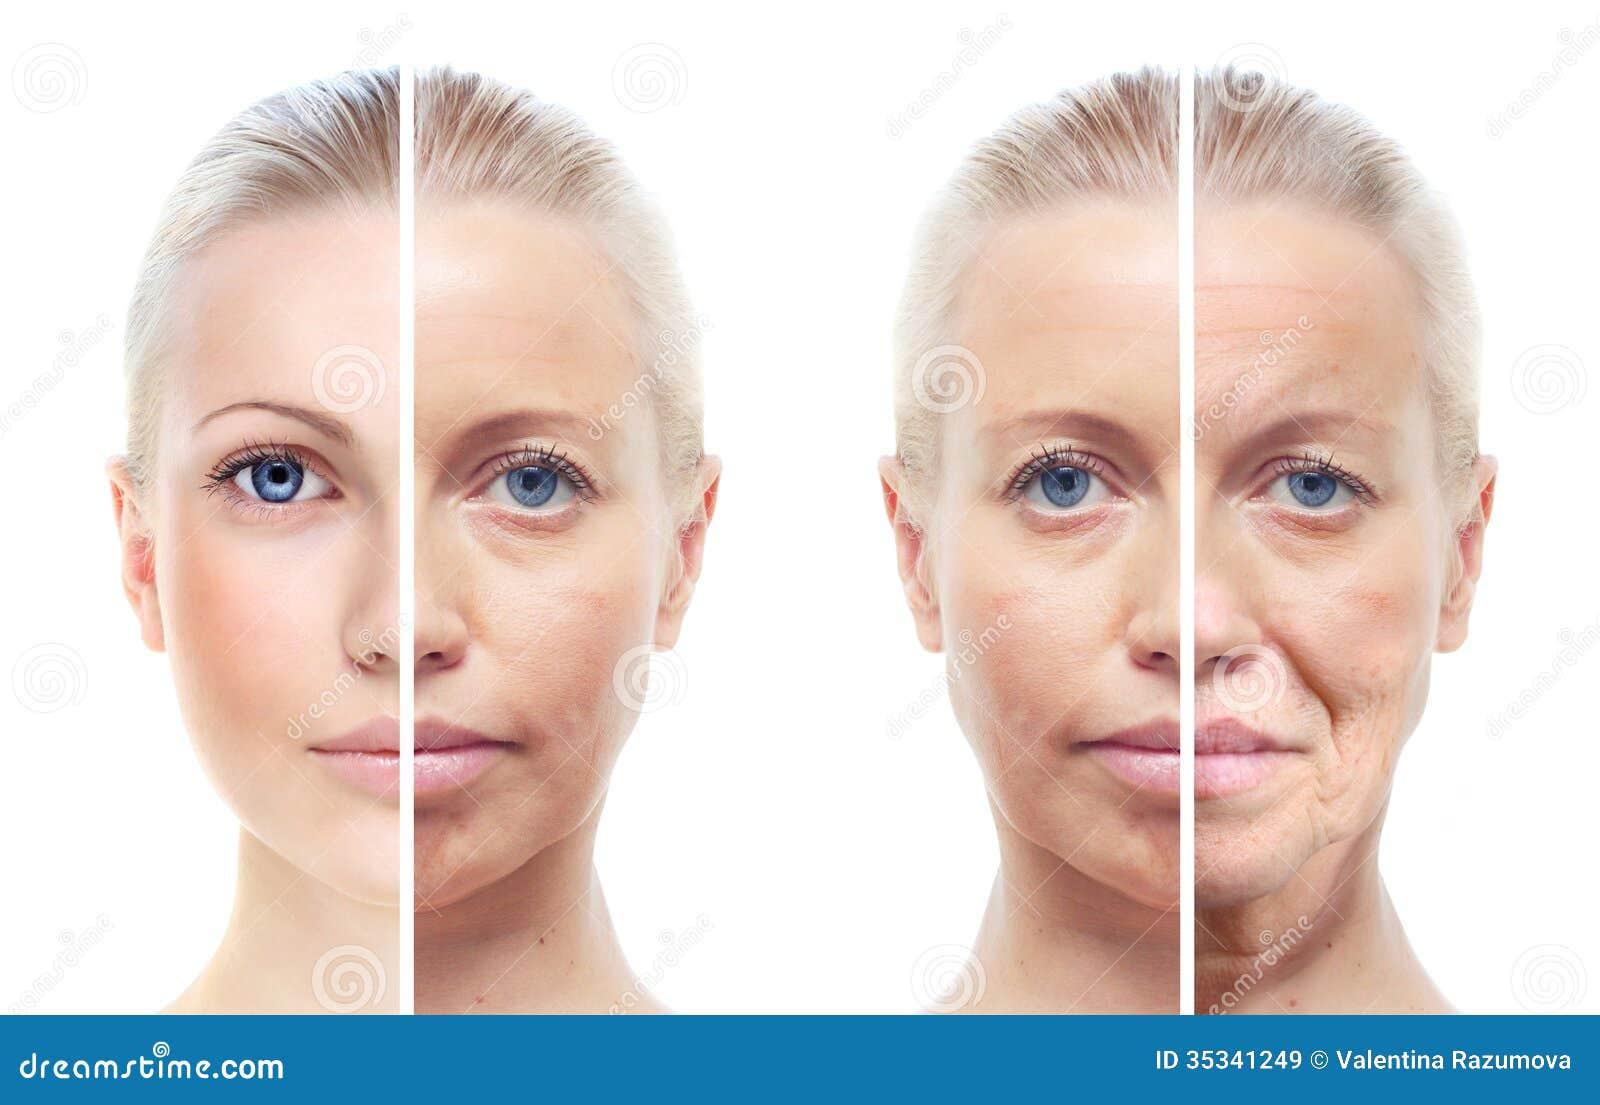 Das Porträt der Frau 20,40,60 Jahre alt.